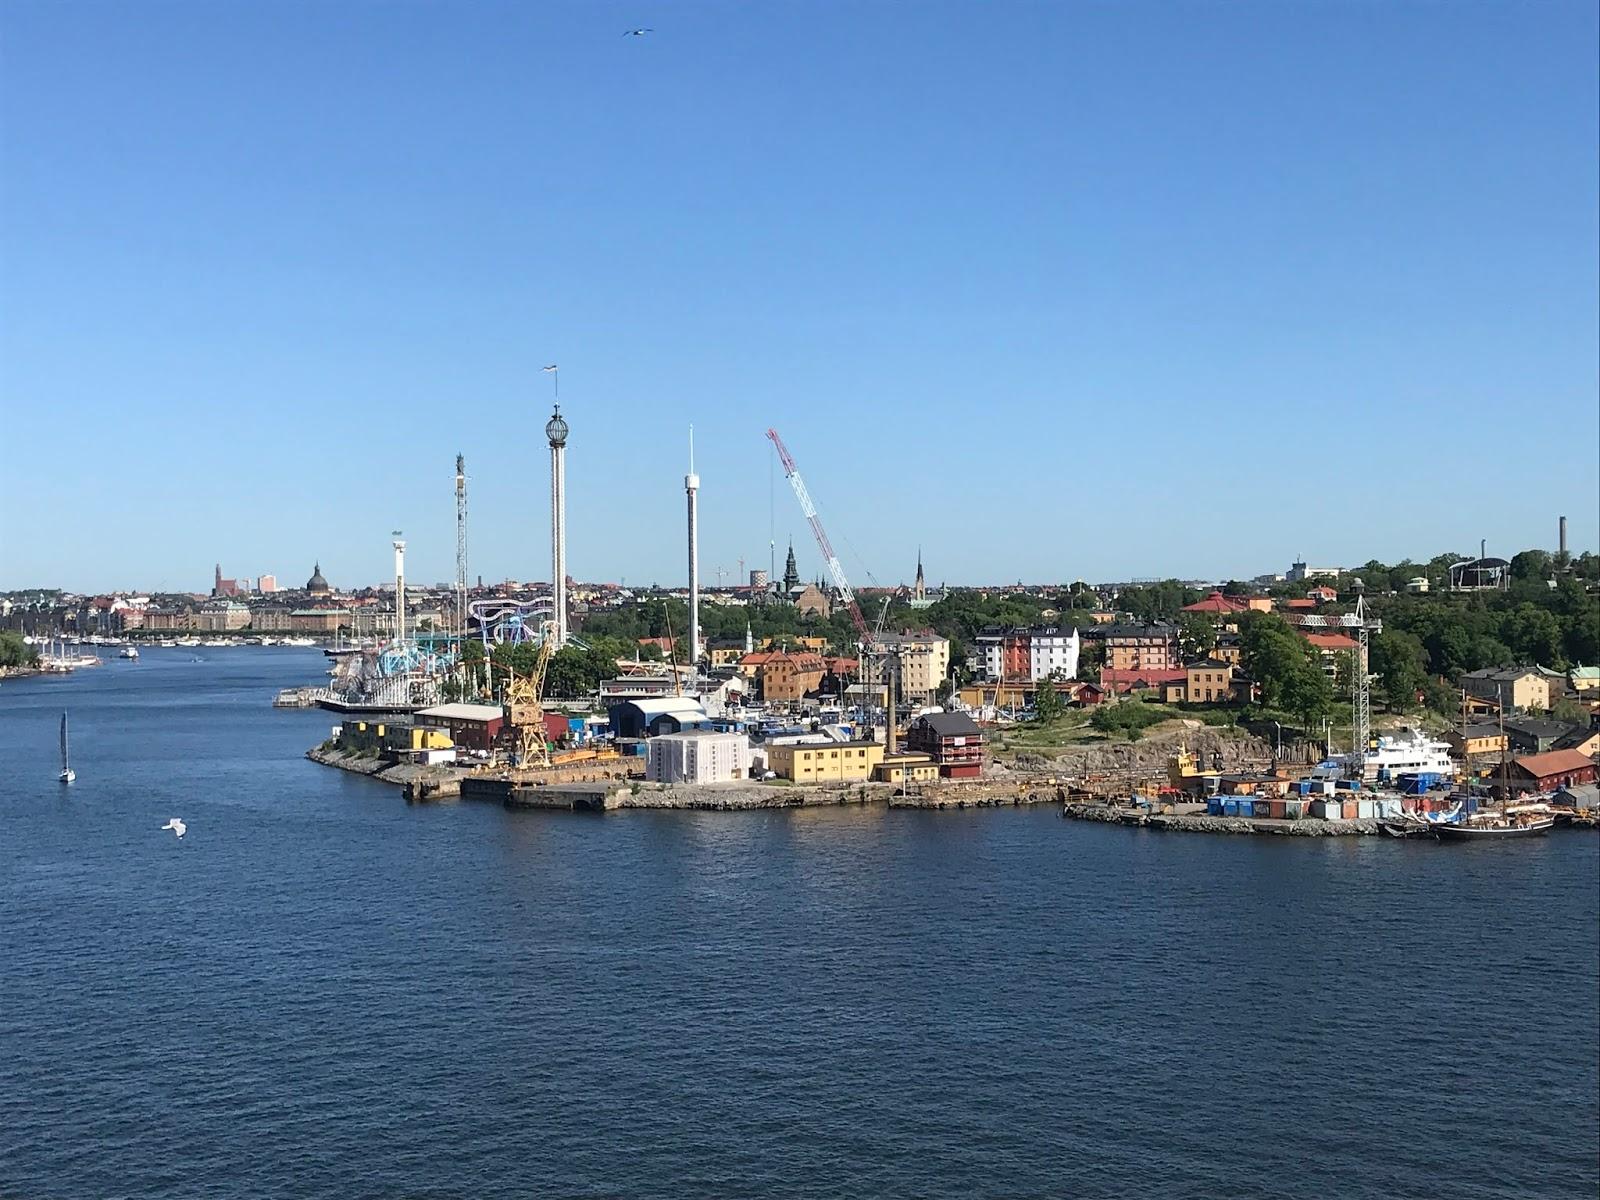 Parque de diversoes em Estocolmo na Suécia